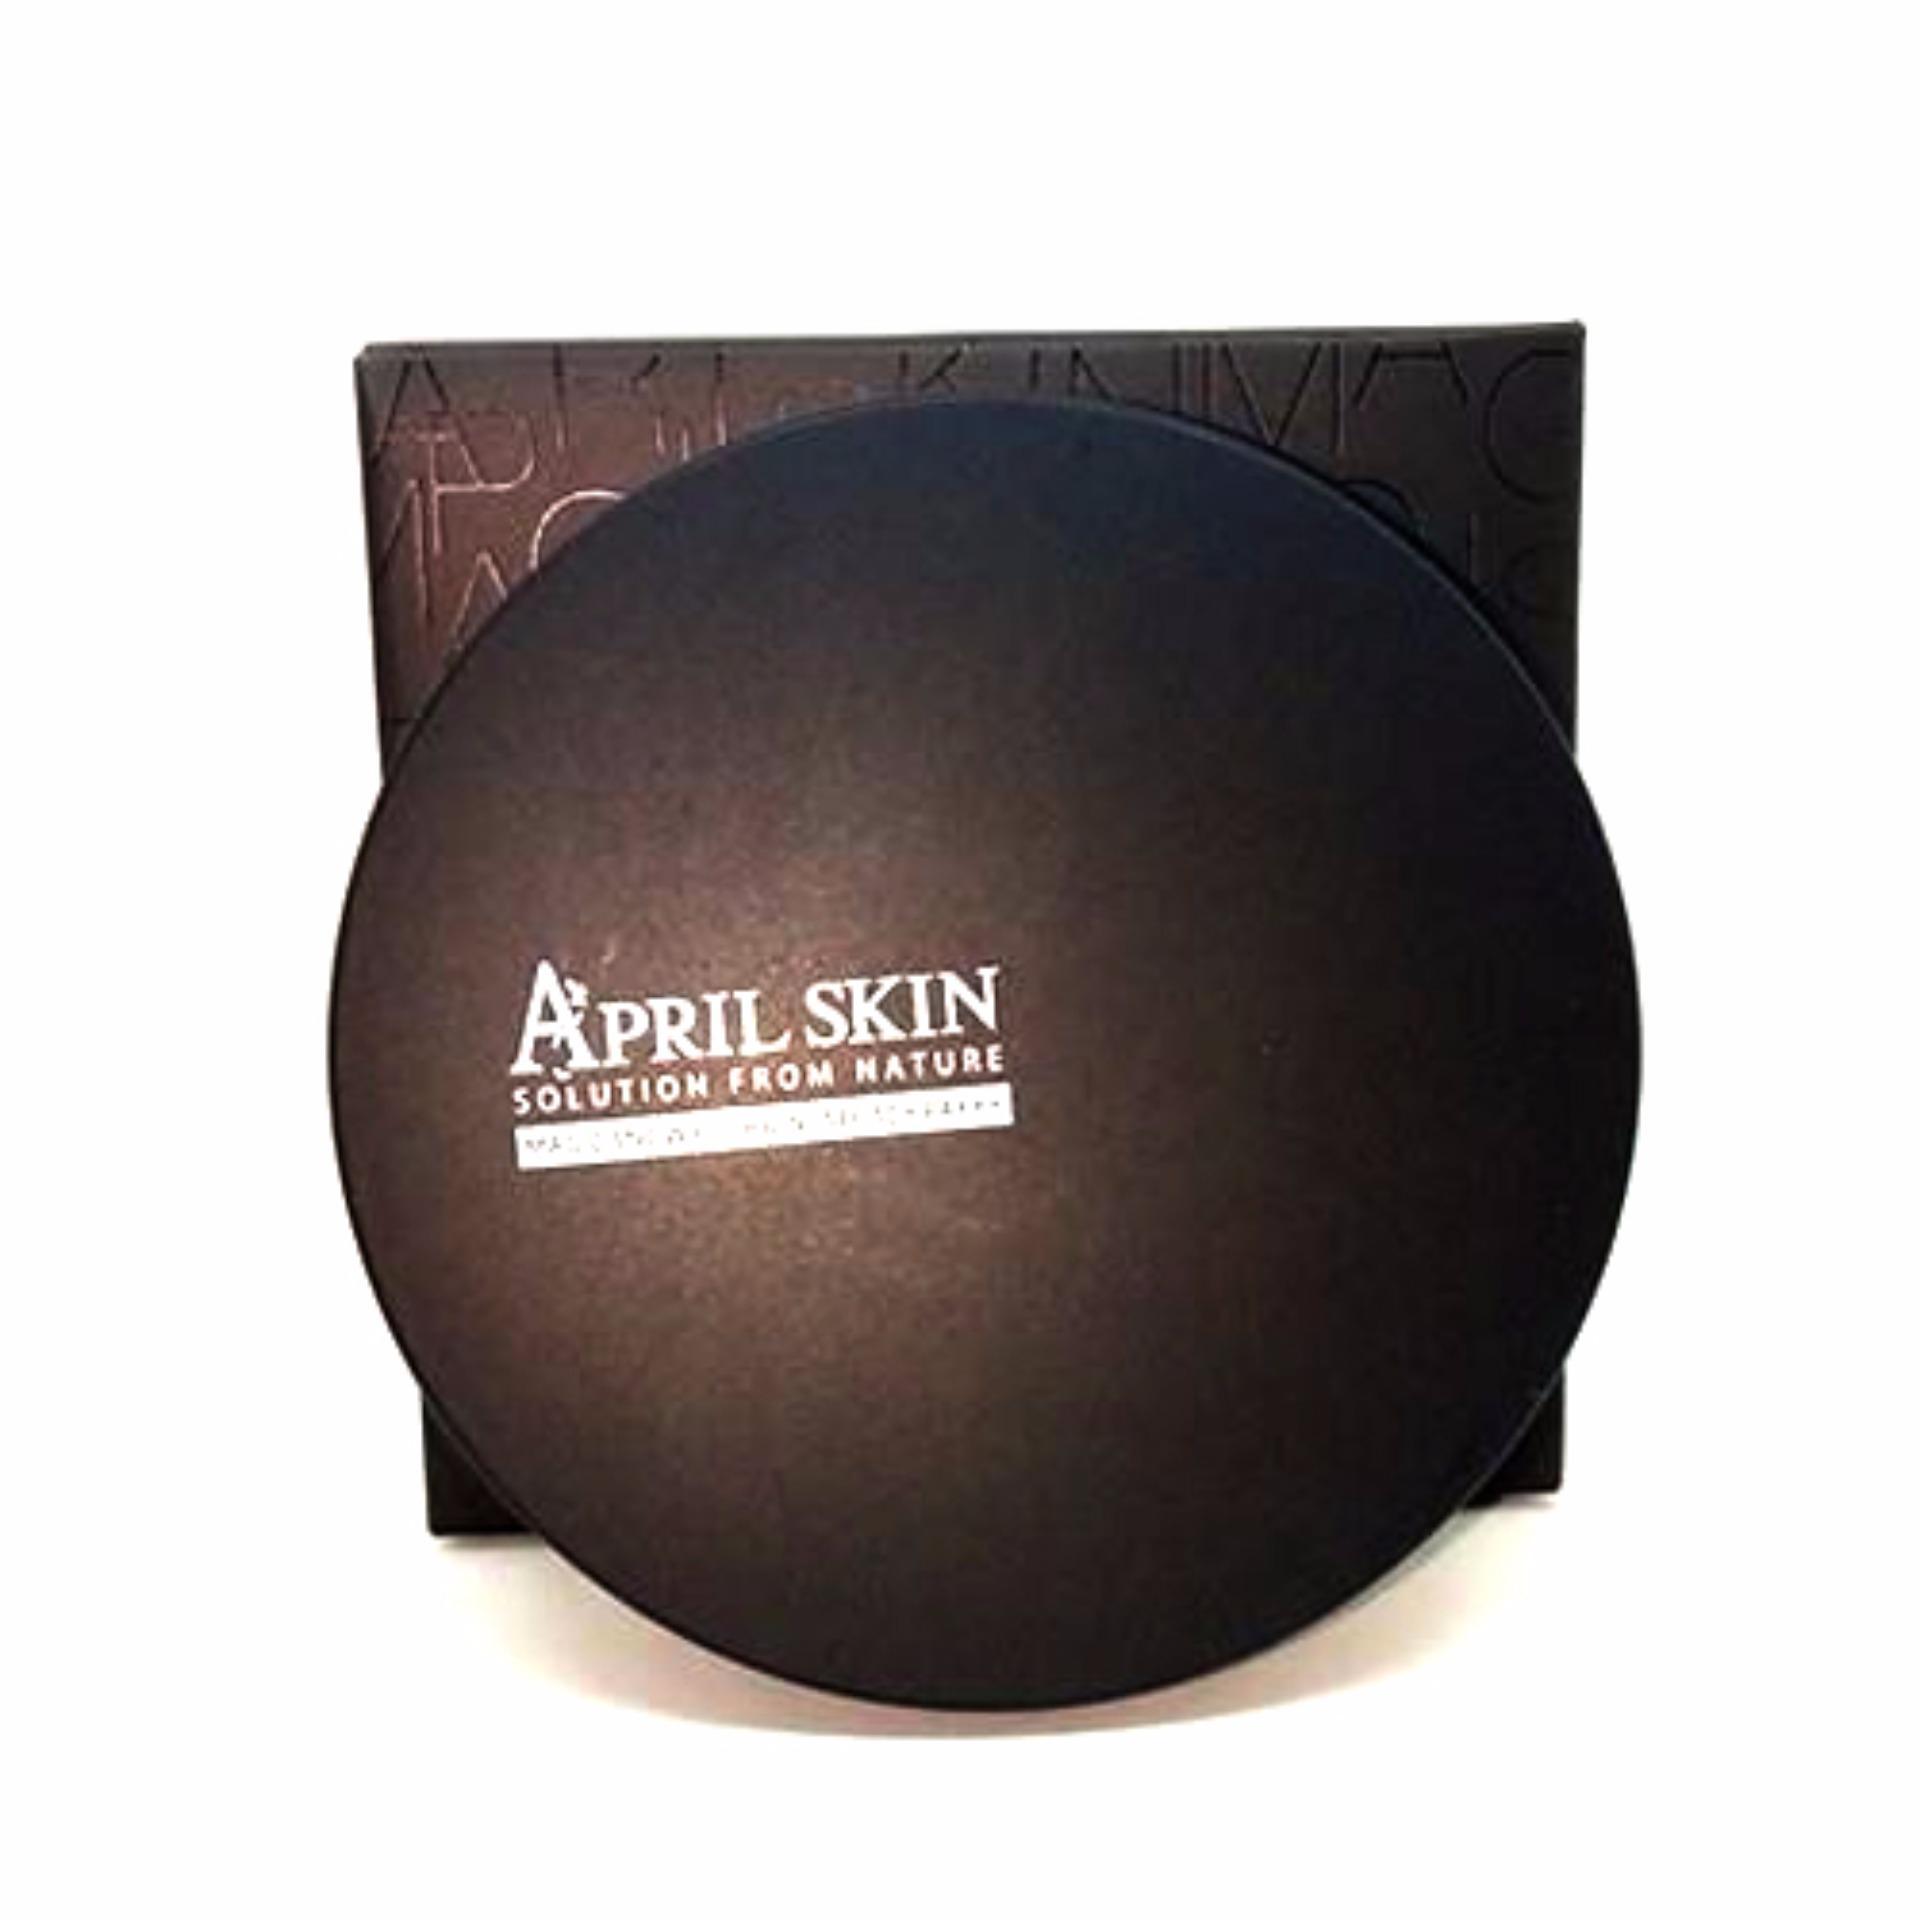 Philippines April Skin Magic Snow Cushion 22 Price Me Aprilskin